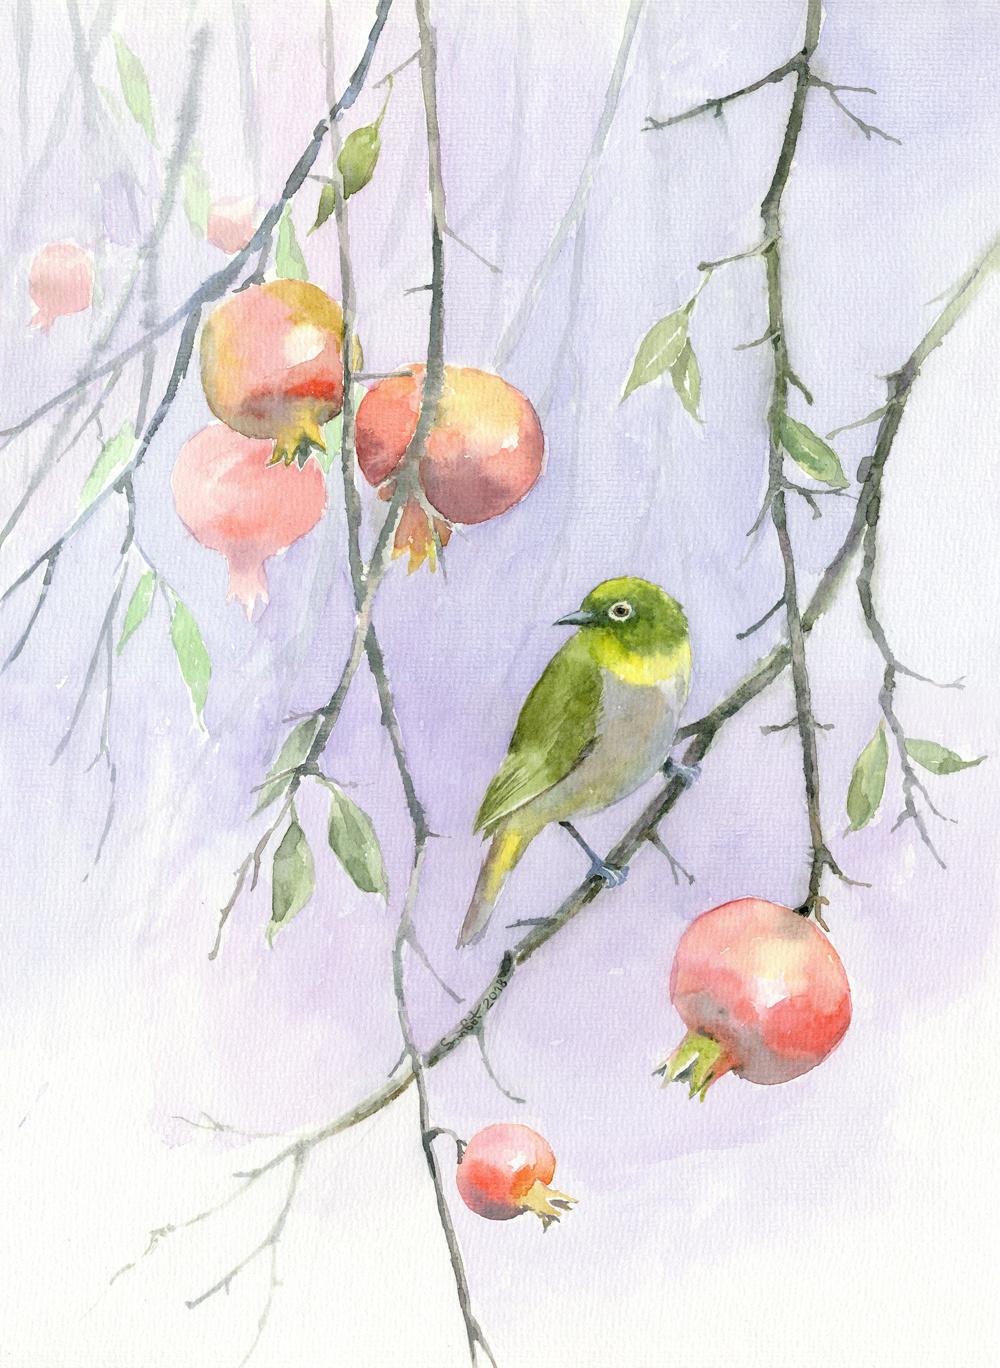 Smbat Arayevich Bagdasaryan. Bird on a pomegranate branch